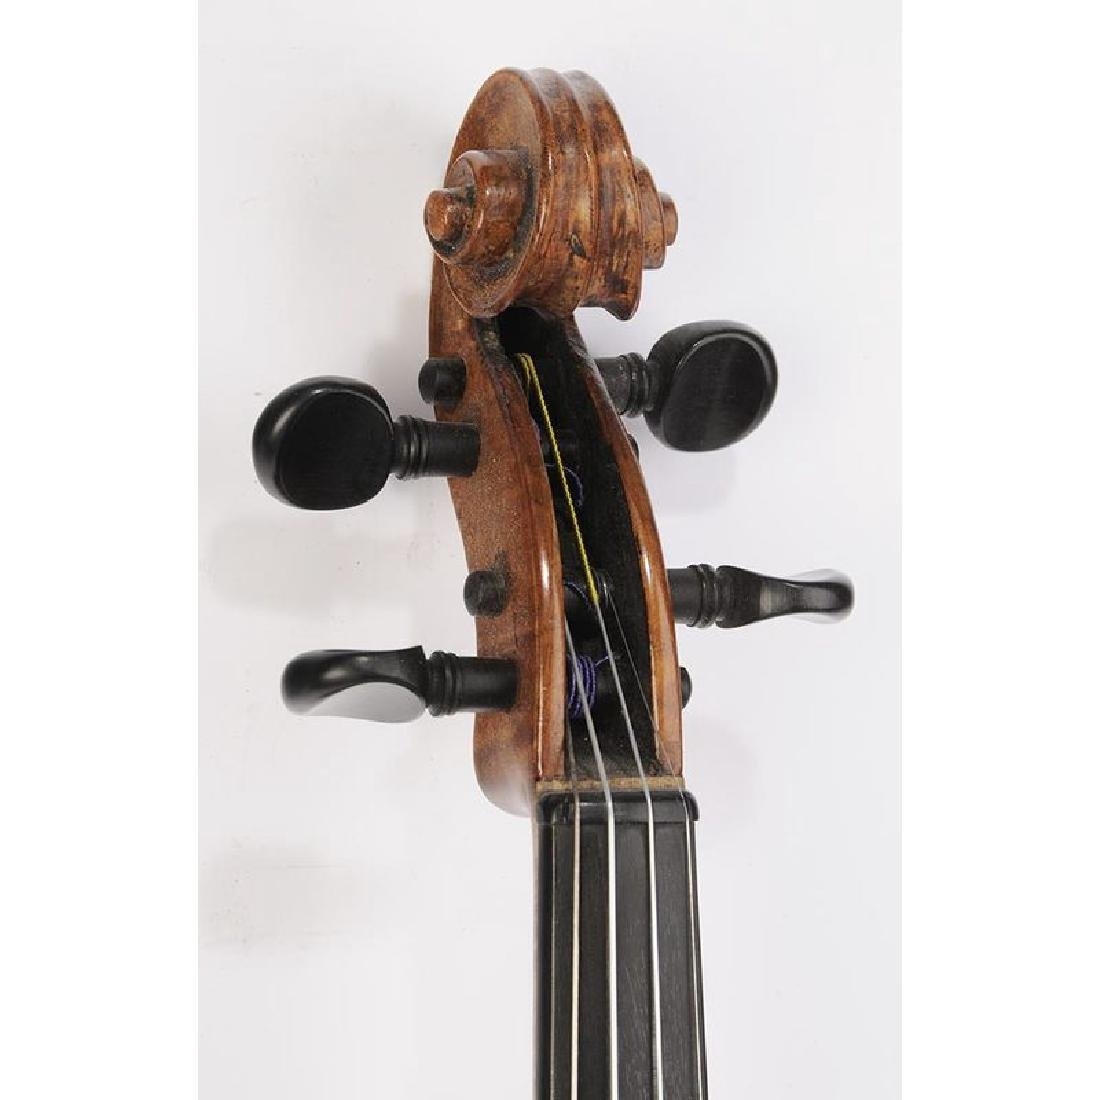 Two Vintage Violins in Cases - 10